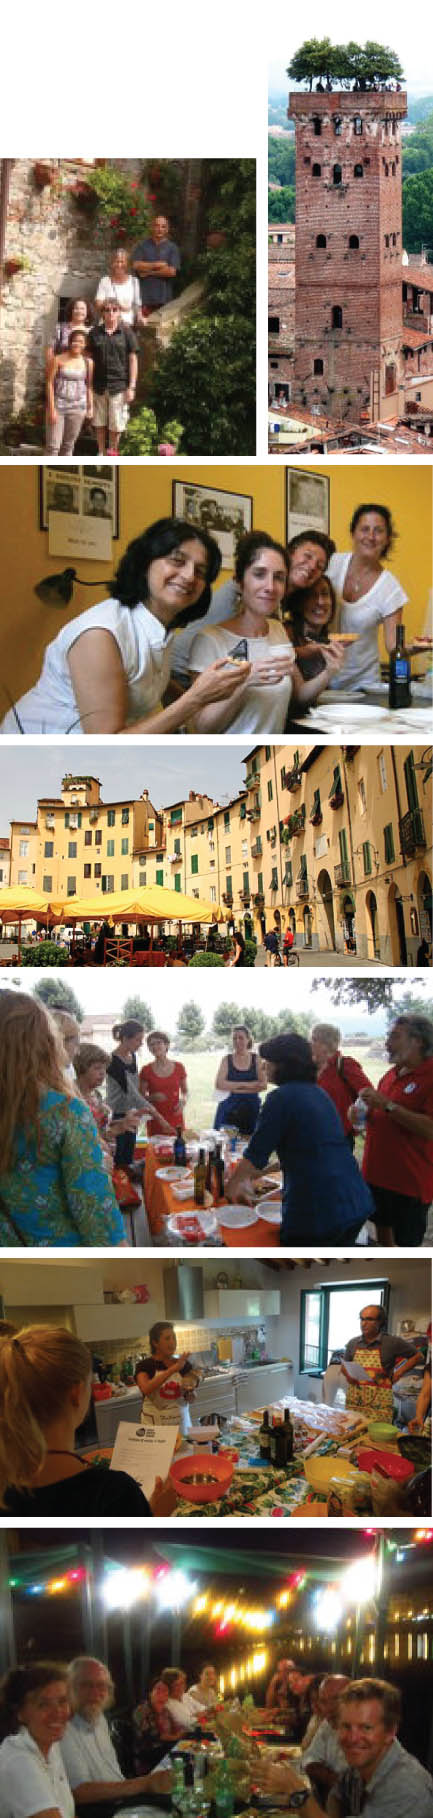 Lucca_SchoolPhilosophypage_pix